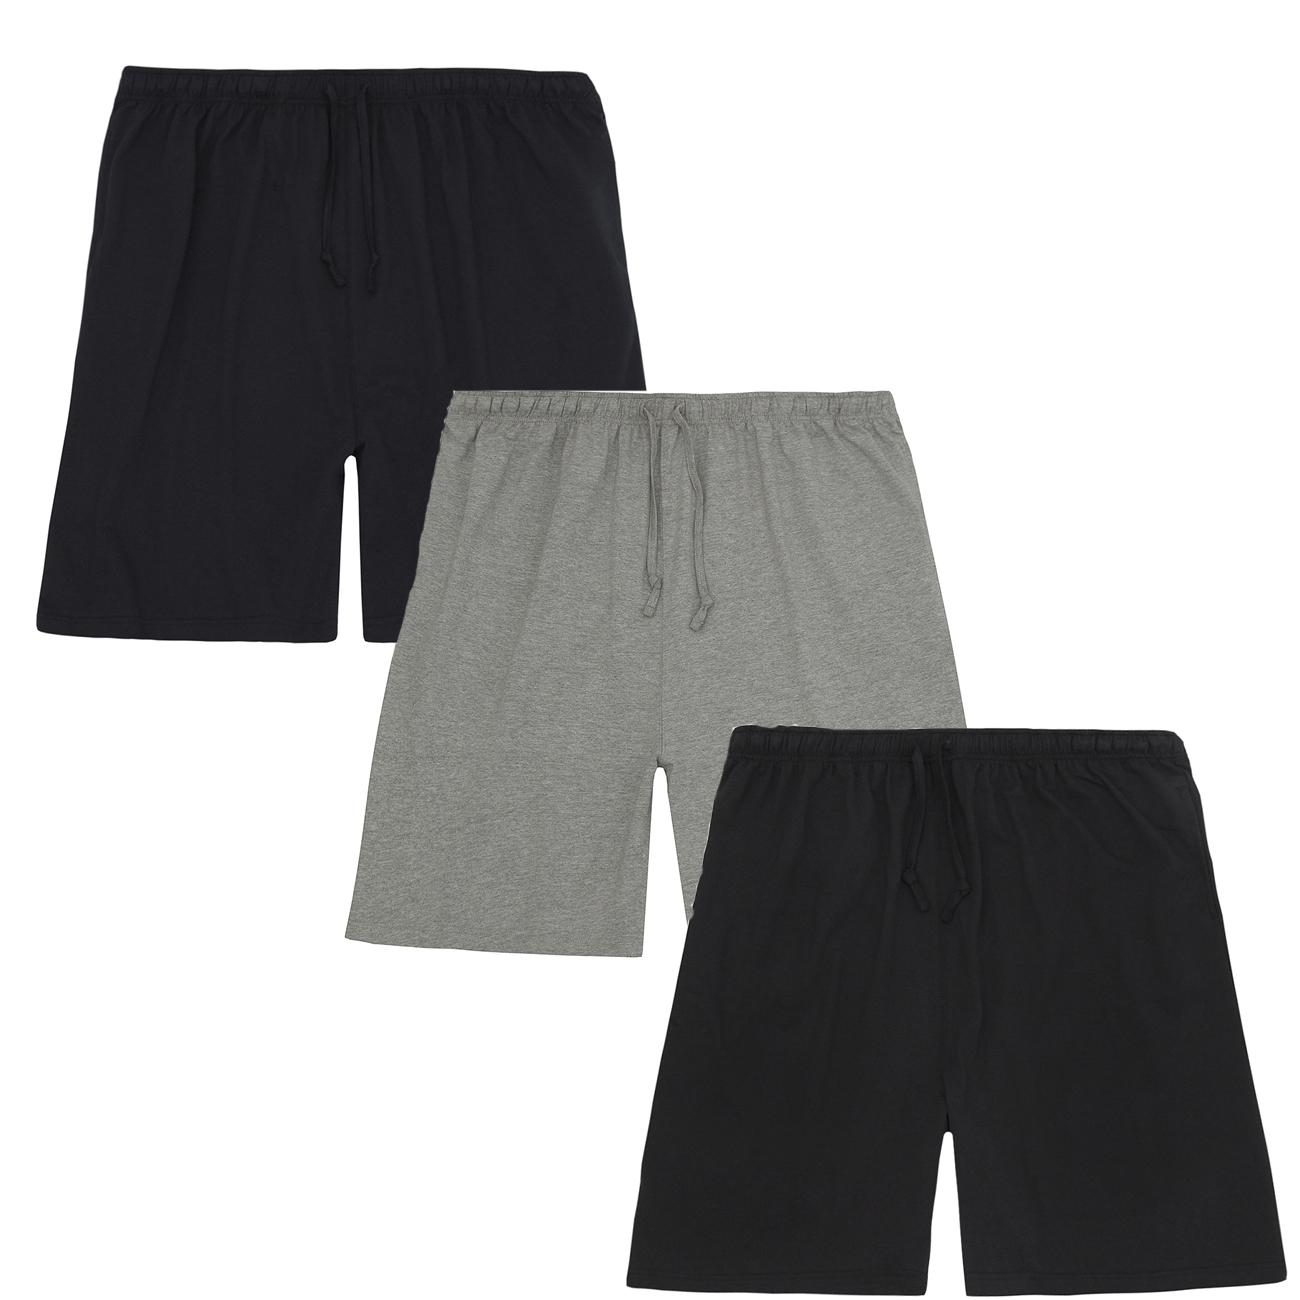 Mens Big Plus Size Jersey Gym Casual Cotton Shorts Bottoms Size 3XL 4XL 5XL